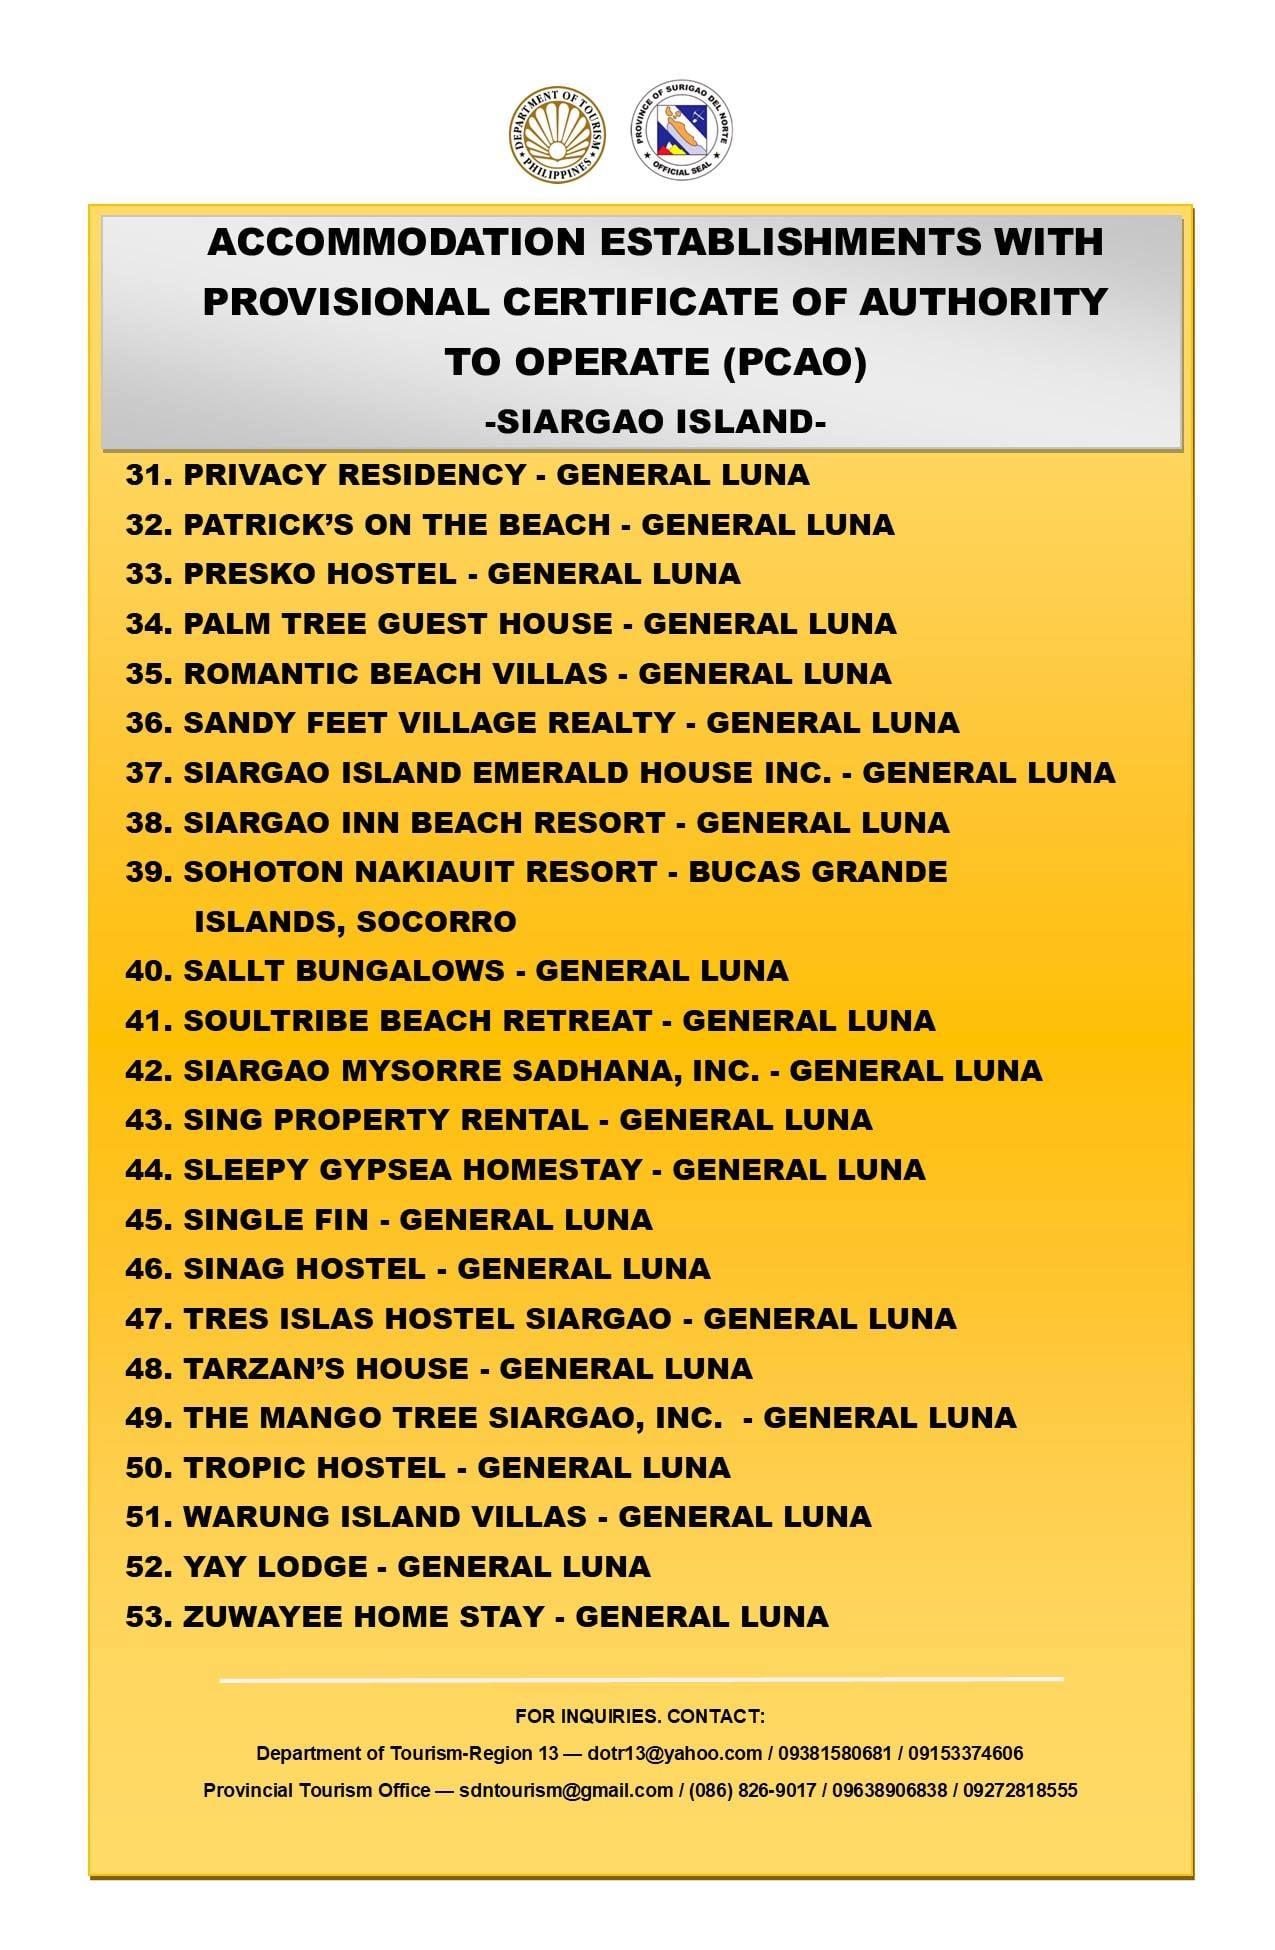 Allowed establishments to operate